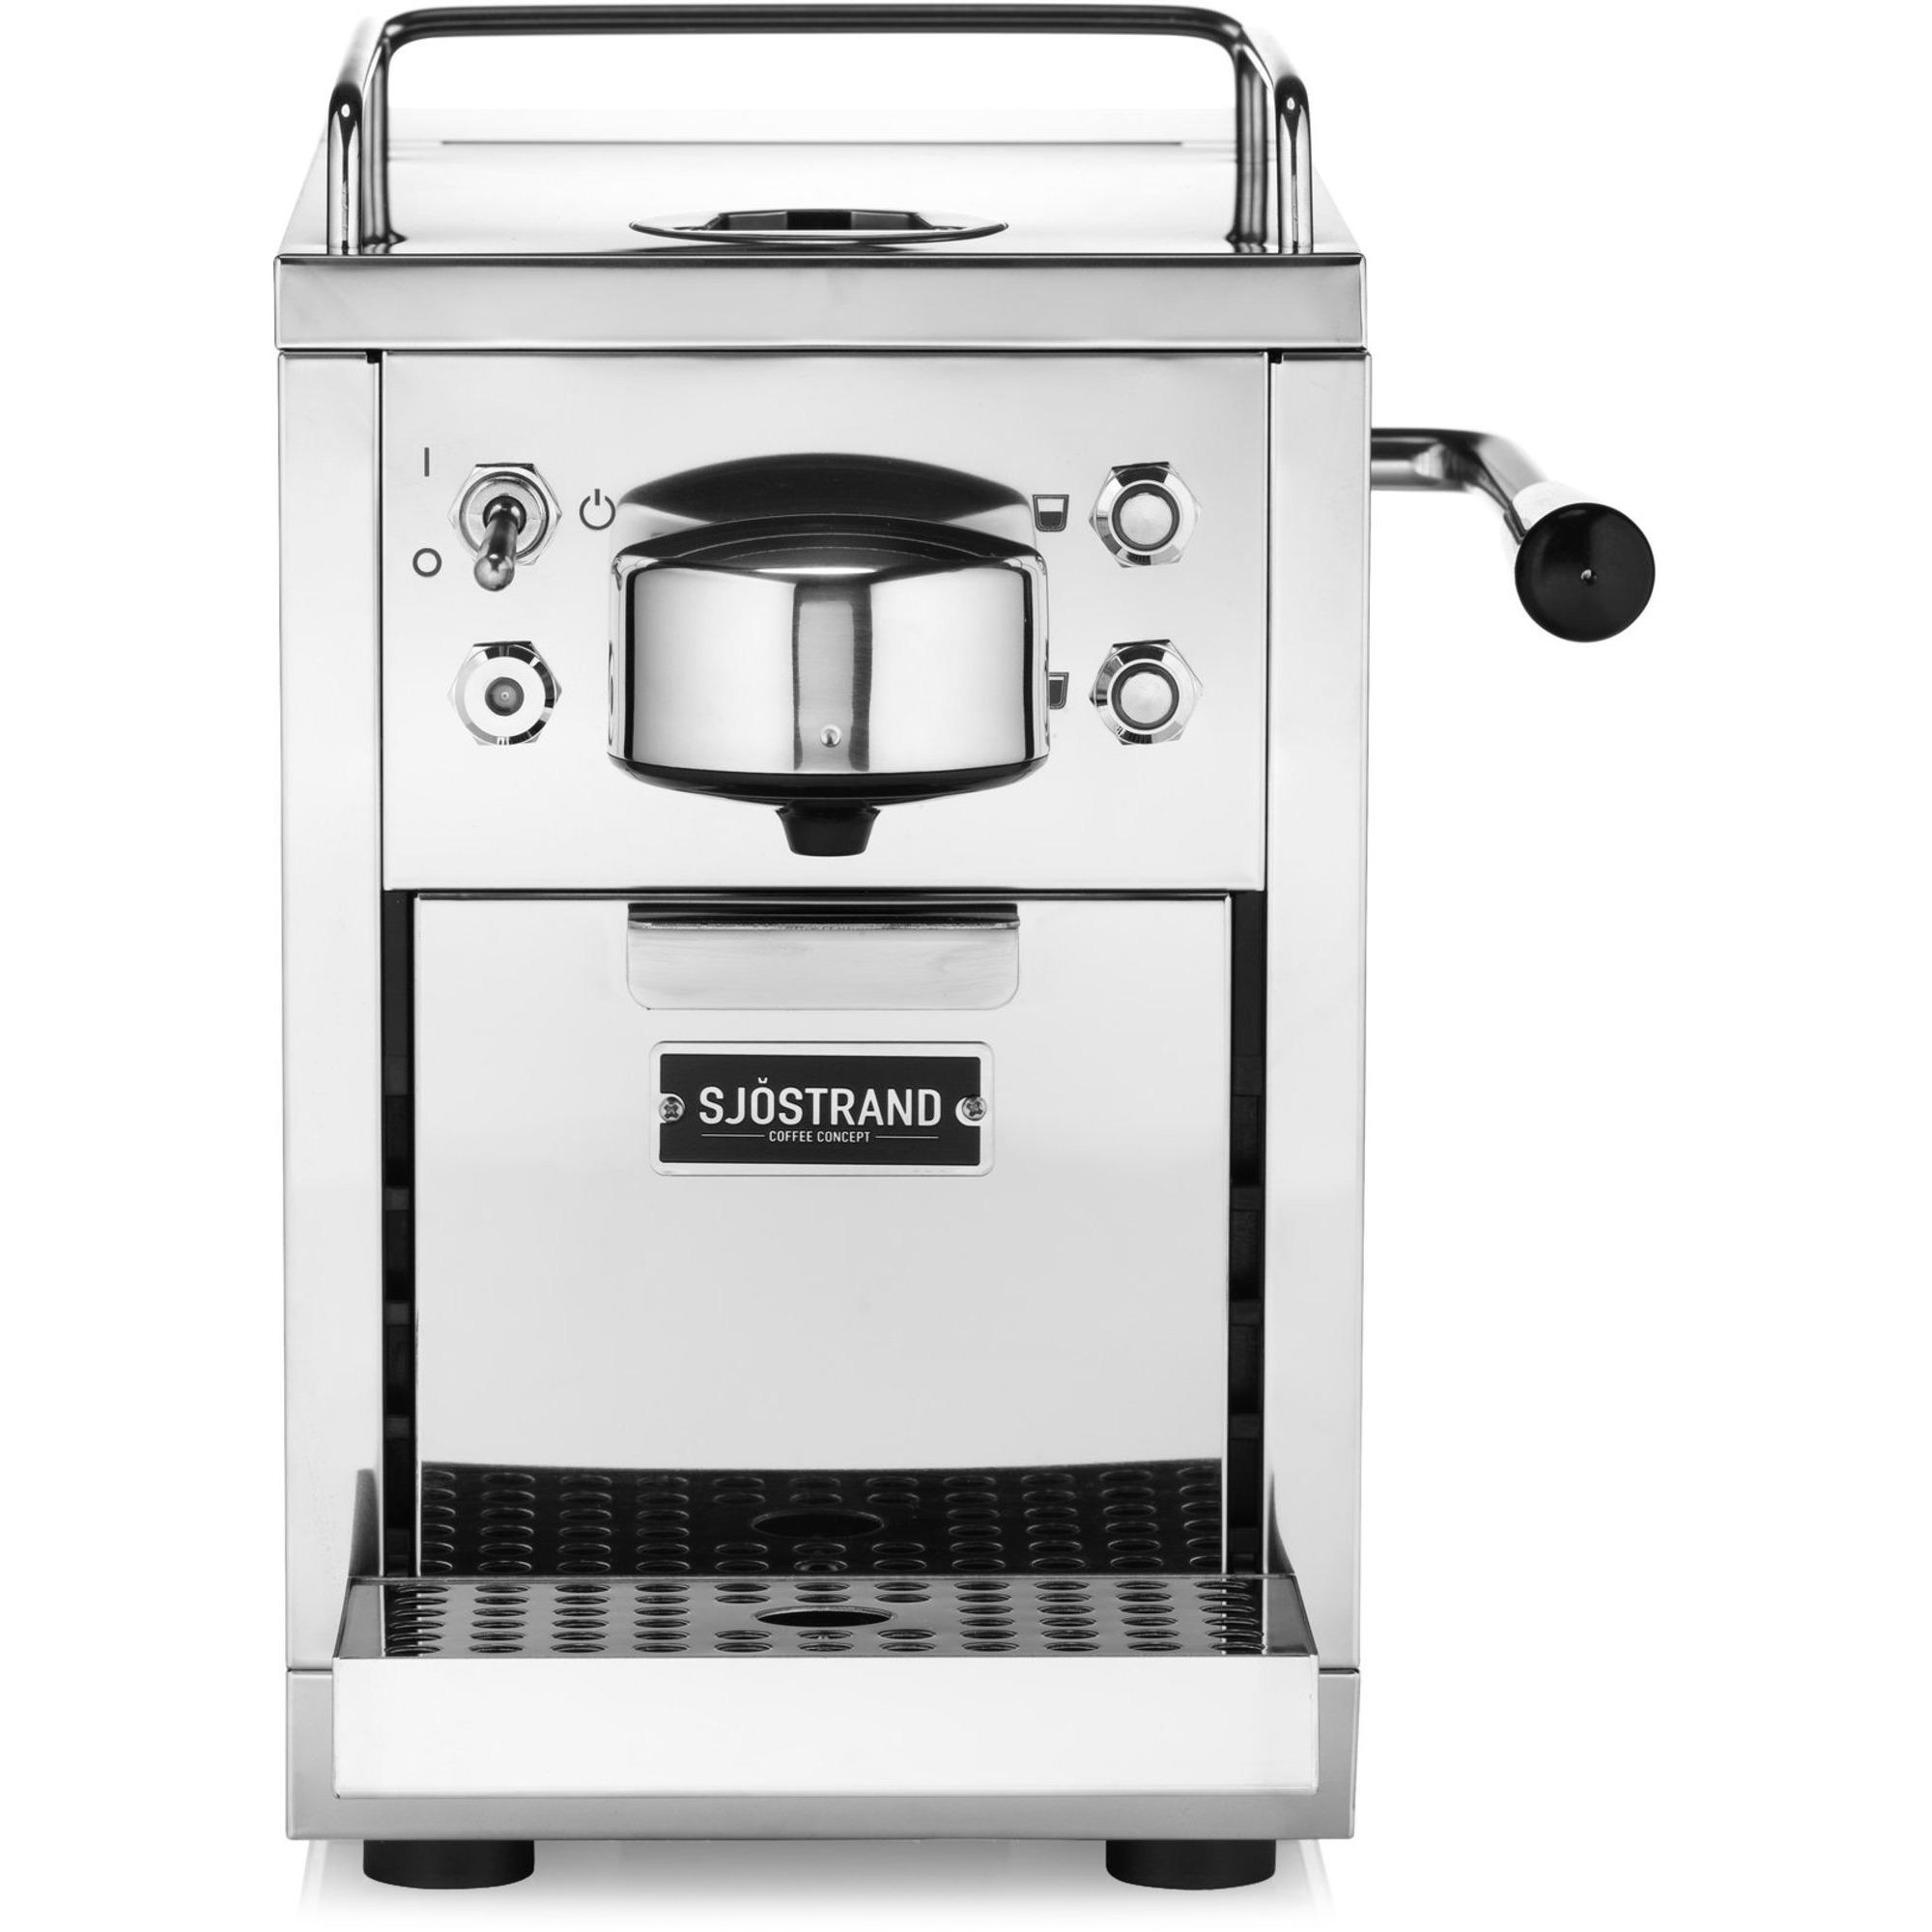 Sjöstrand Espresso kapselmaskin